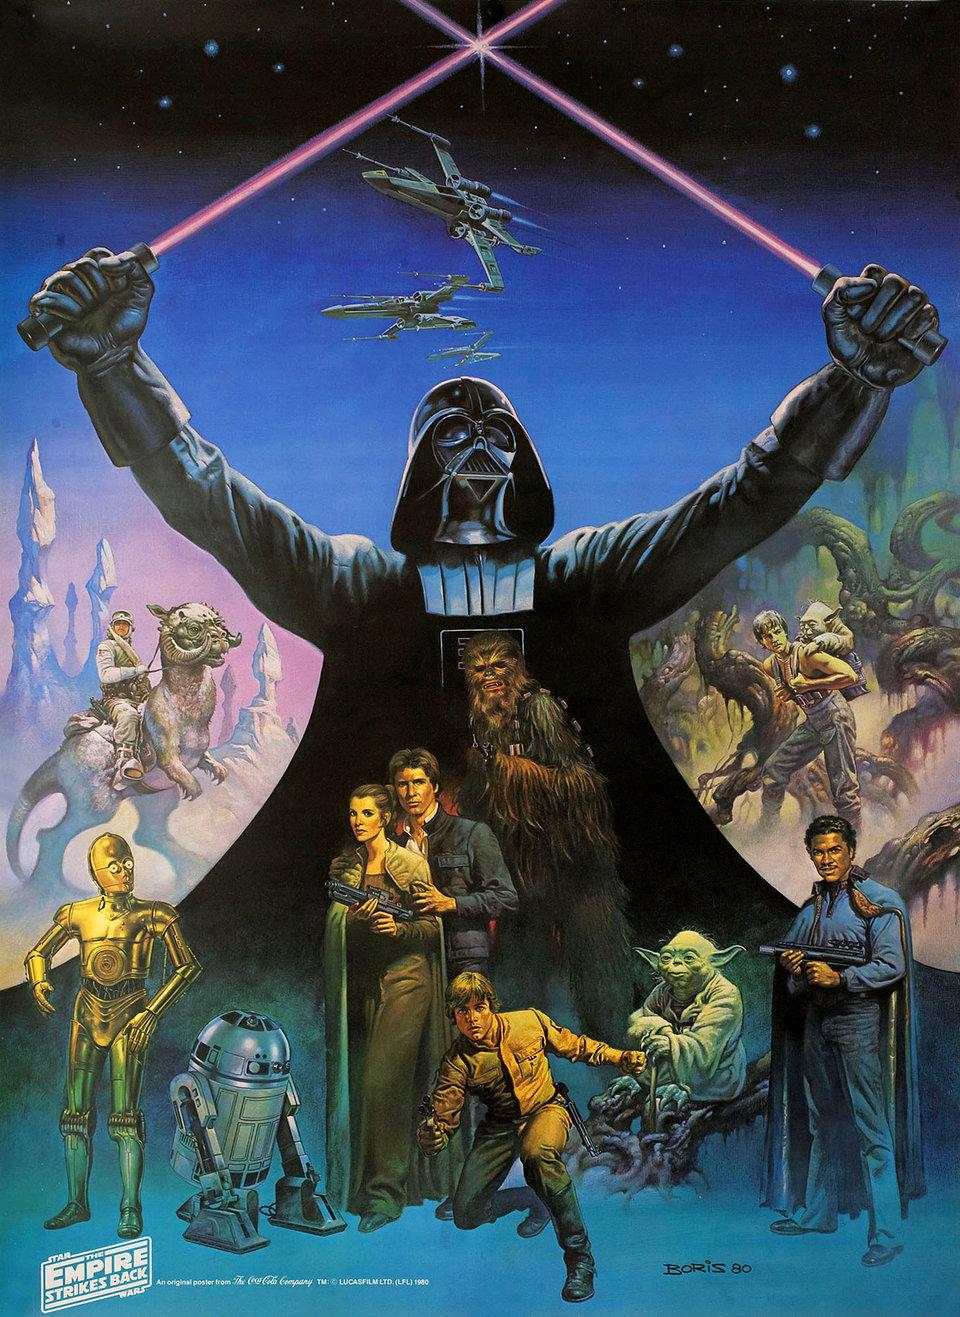 The Empire Strikes Back 1980 U.S. Poster